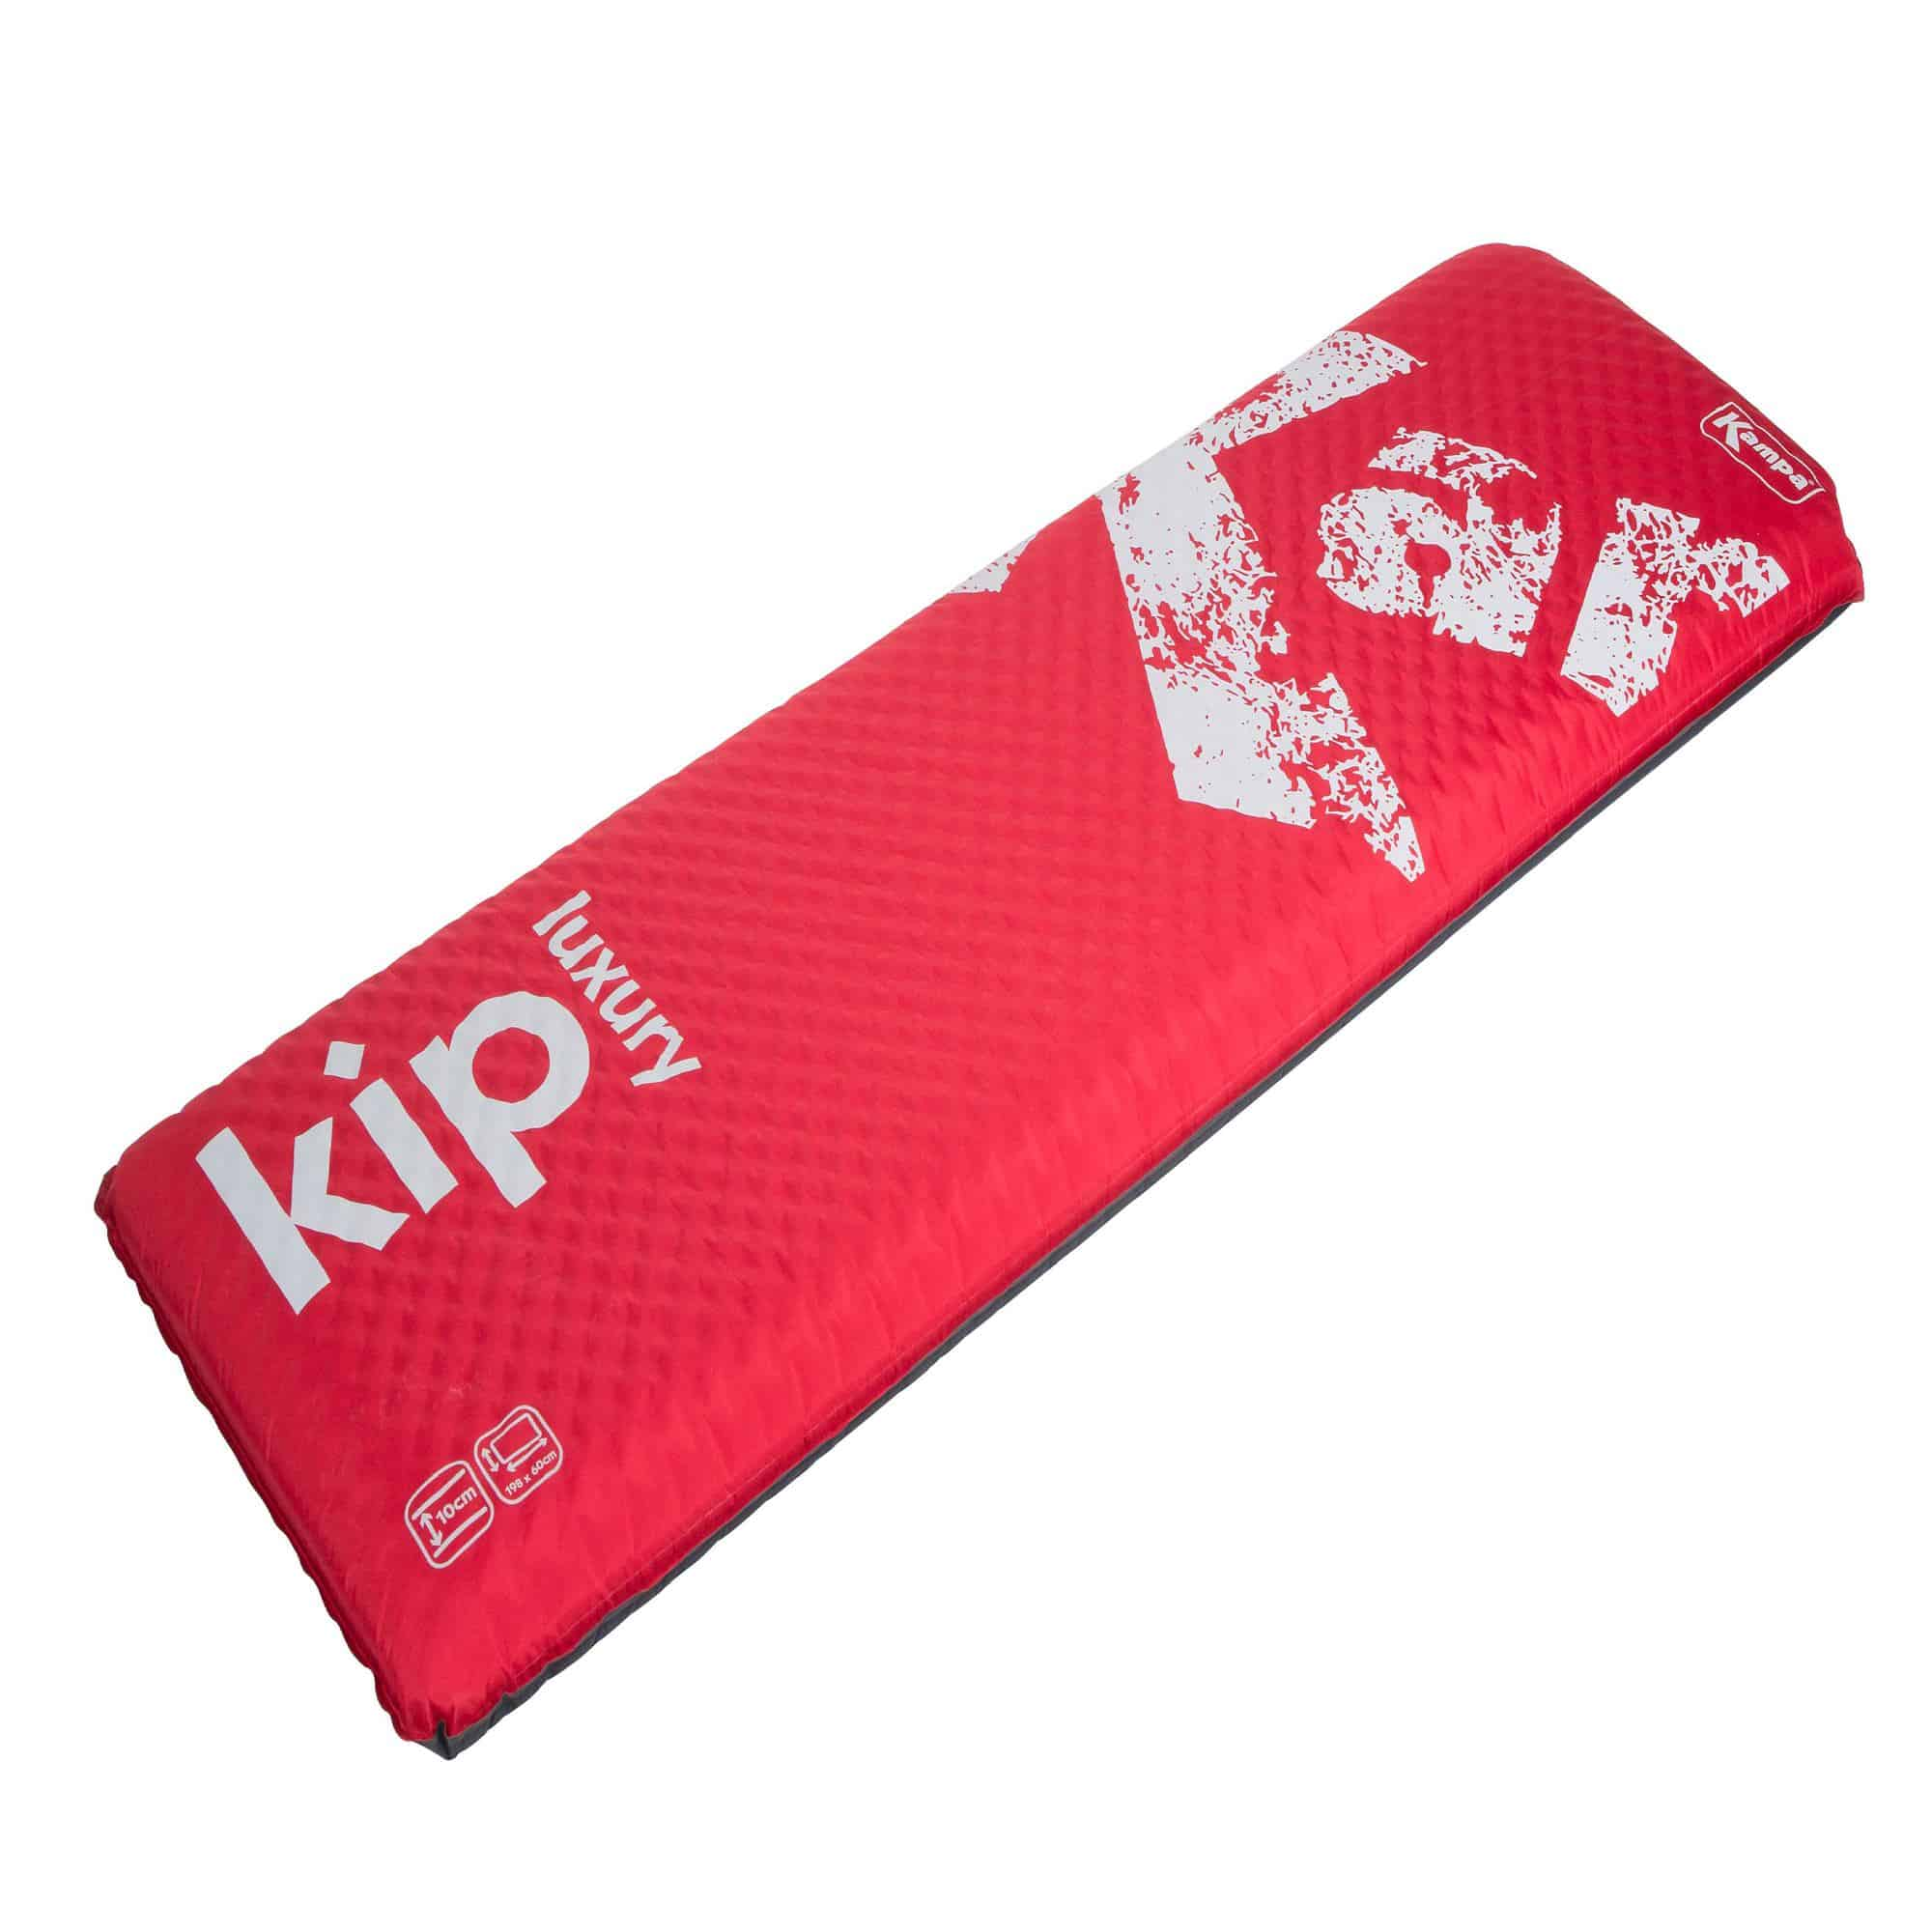 Kampa Kip Double Self Inflating Mat Luxury 10cm